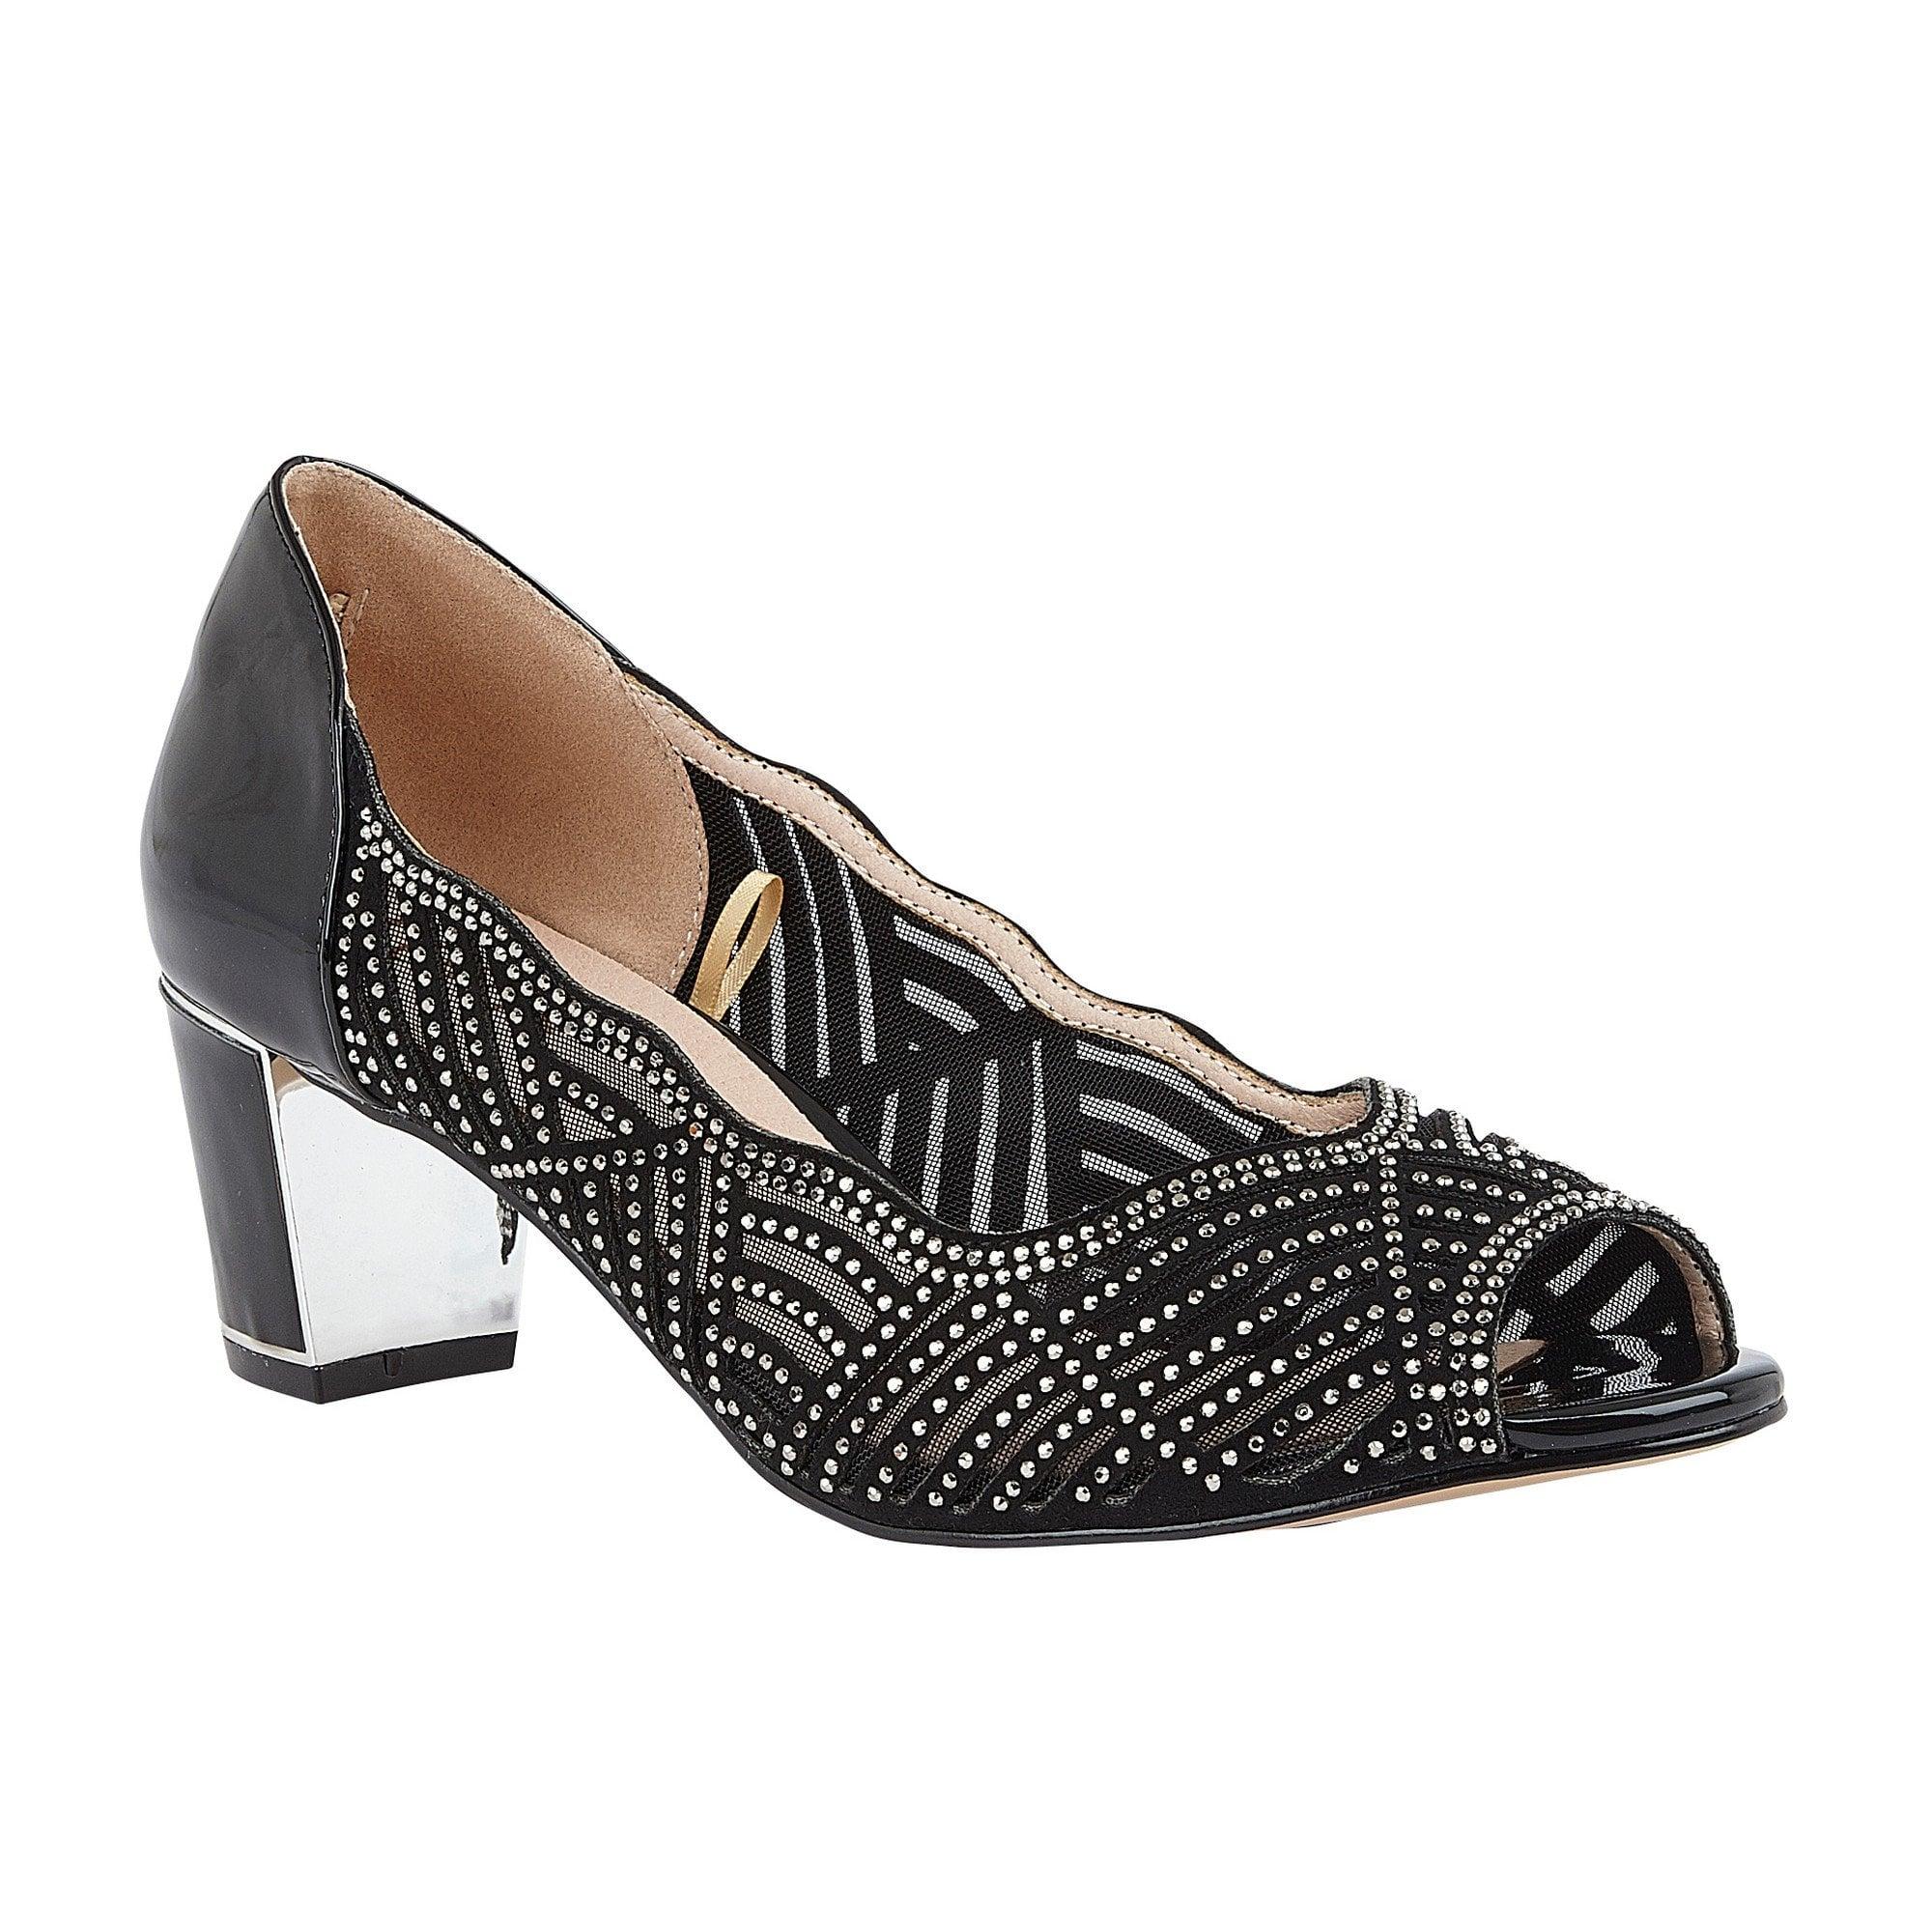 Lotus ladies' Immy peep toe shoes